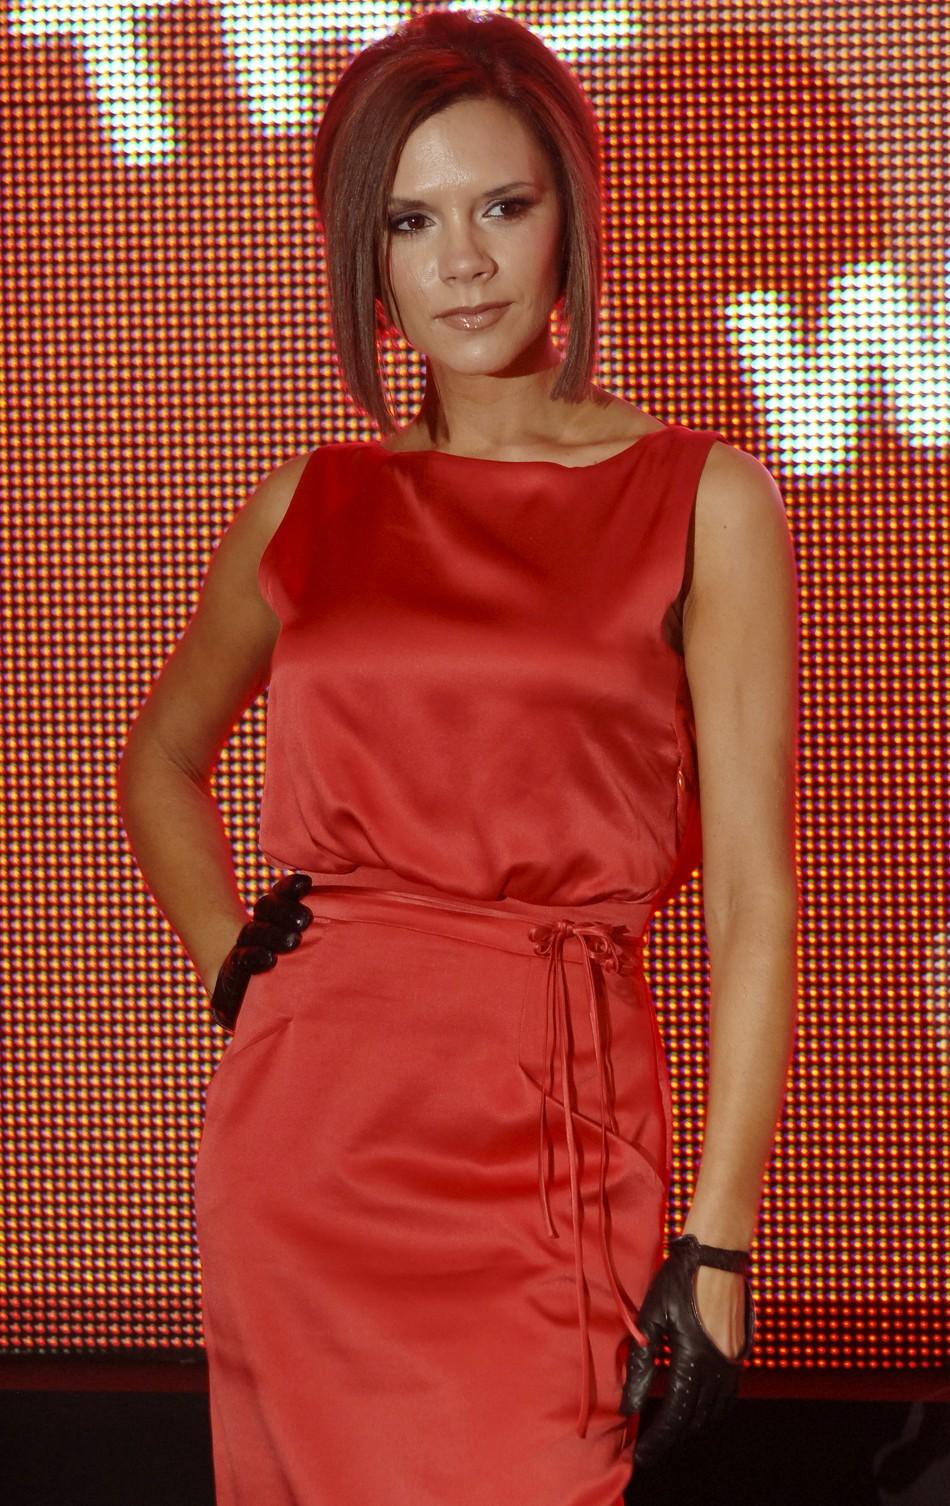 Victoria Beckham Announced International Ambassador for UKs Great Tourism Campaign